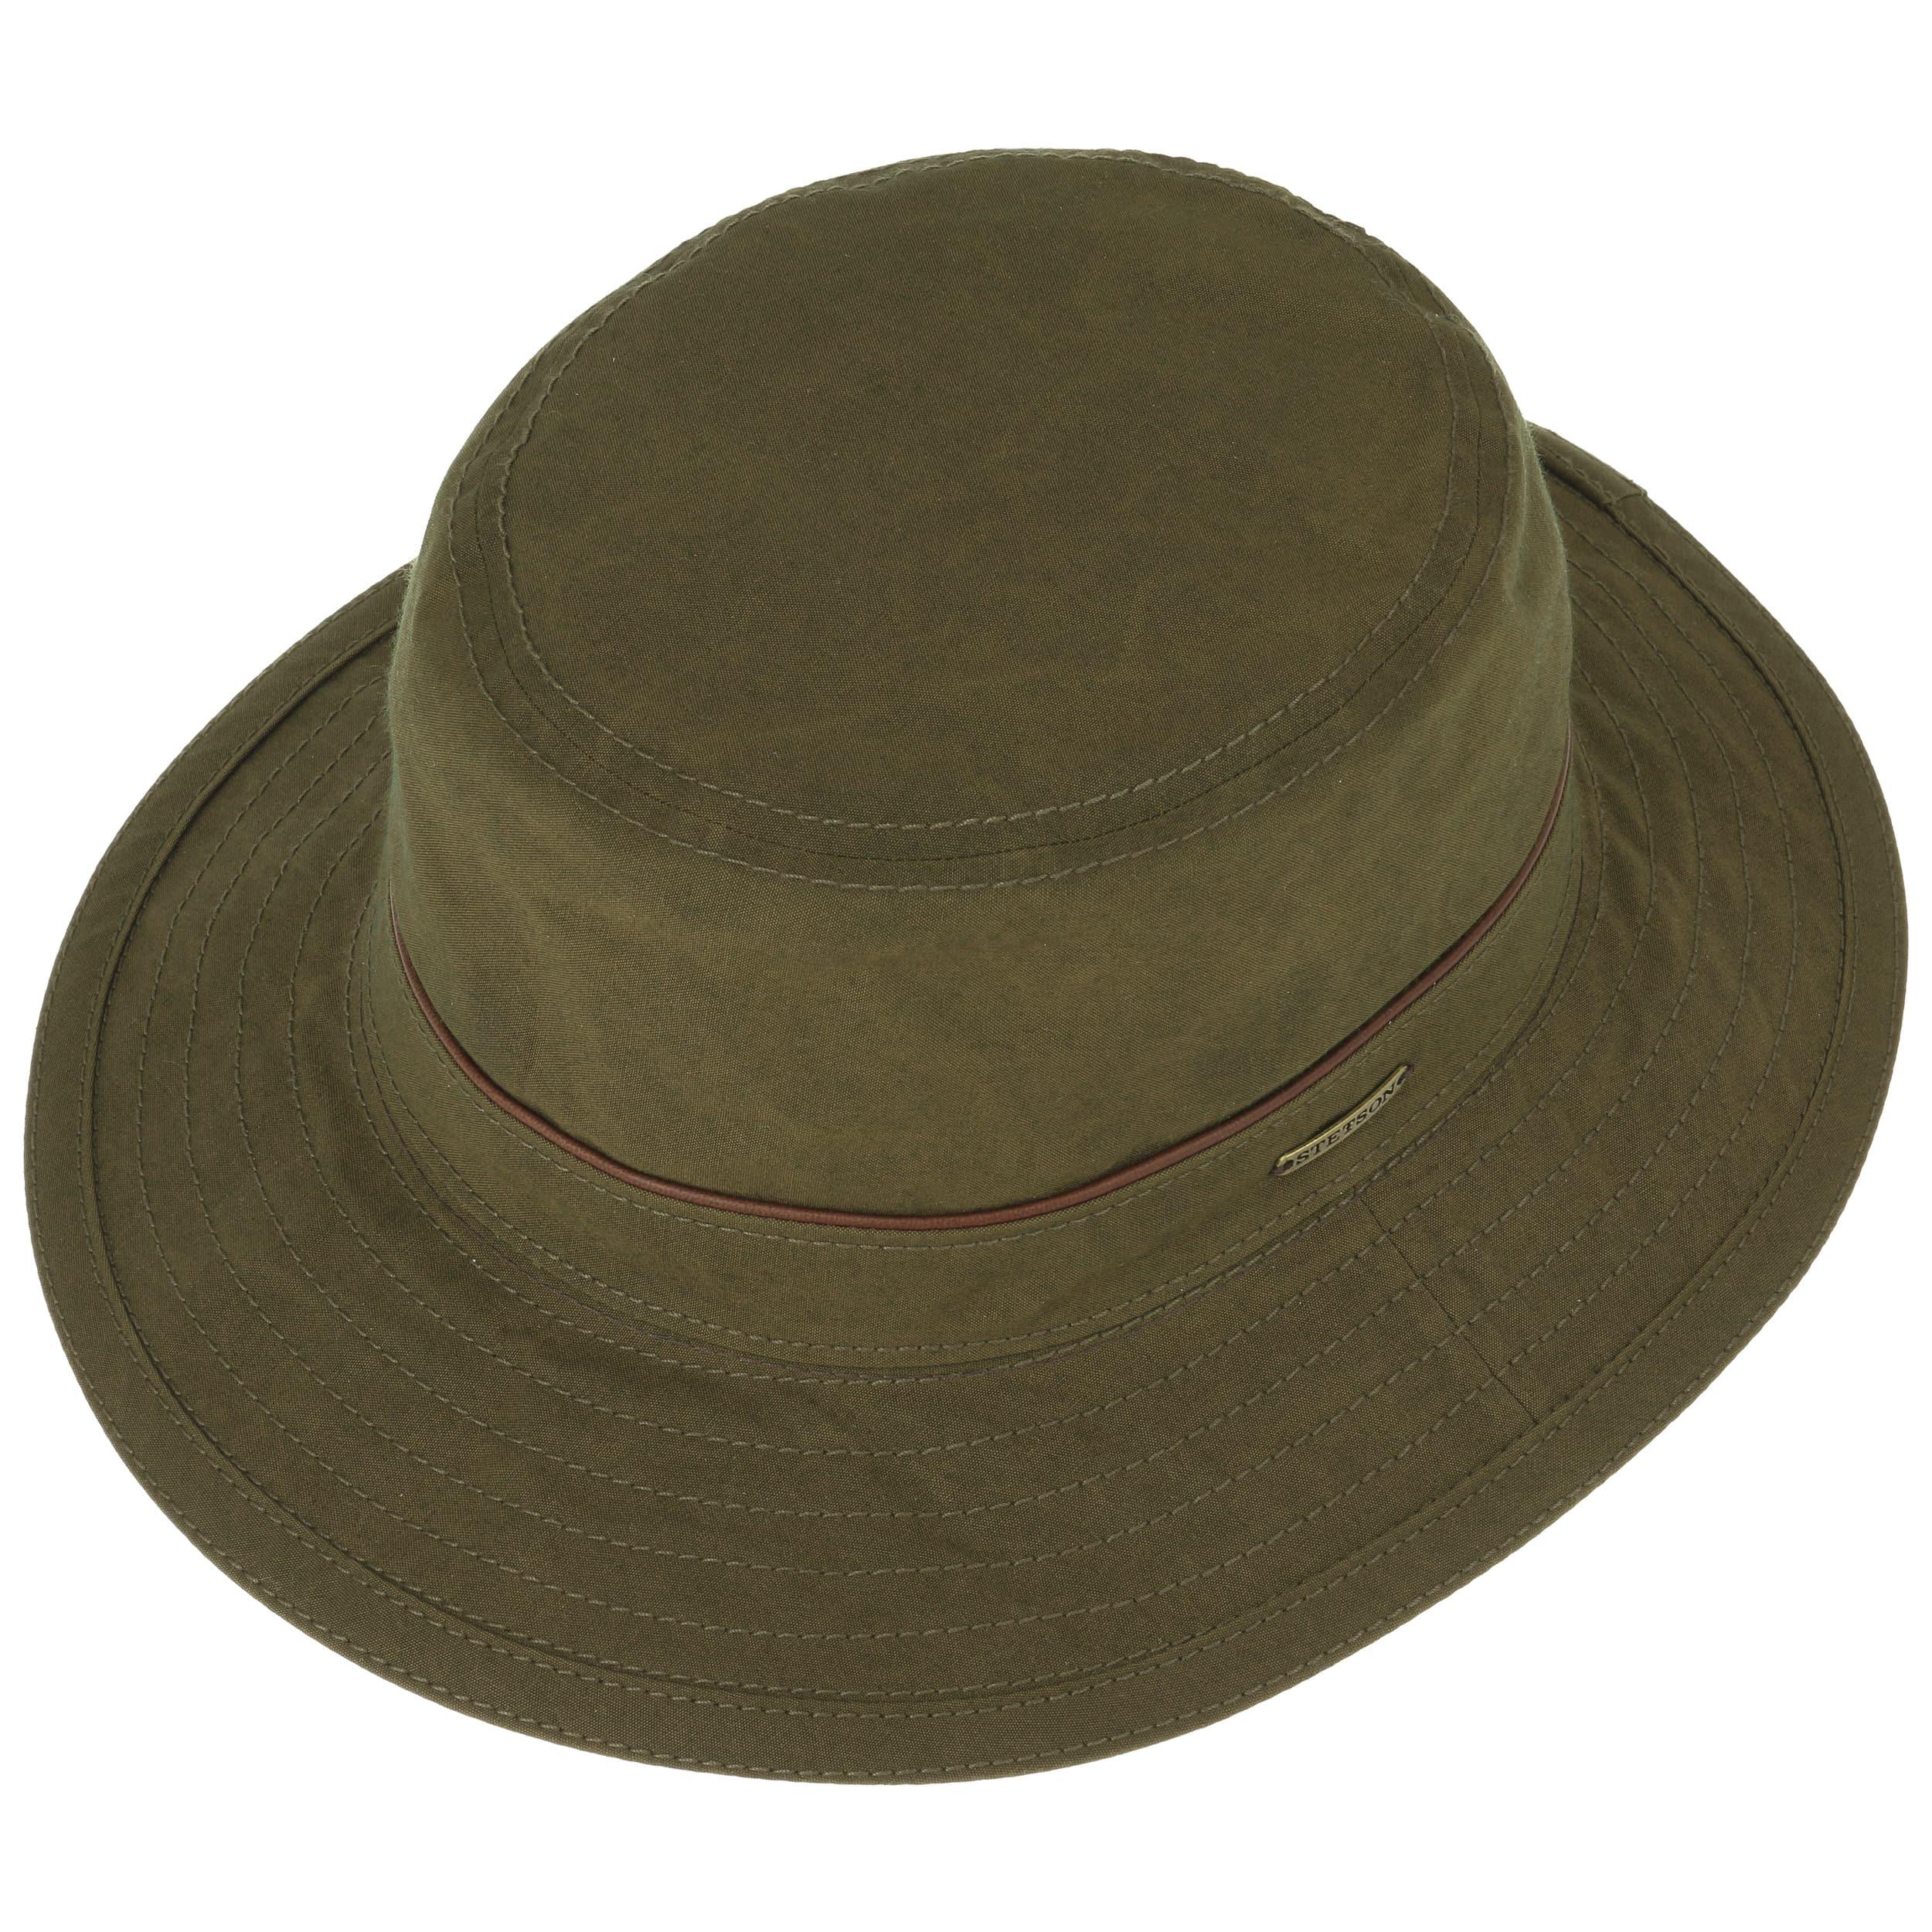 Waxed Cotton Bucket Outdoor Hat by Stetson Bucket hats Stetson HpRjZQt8rC